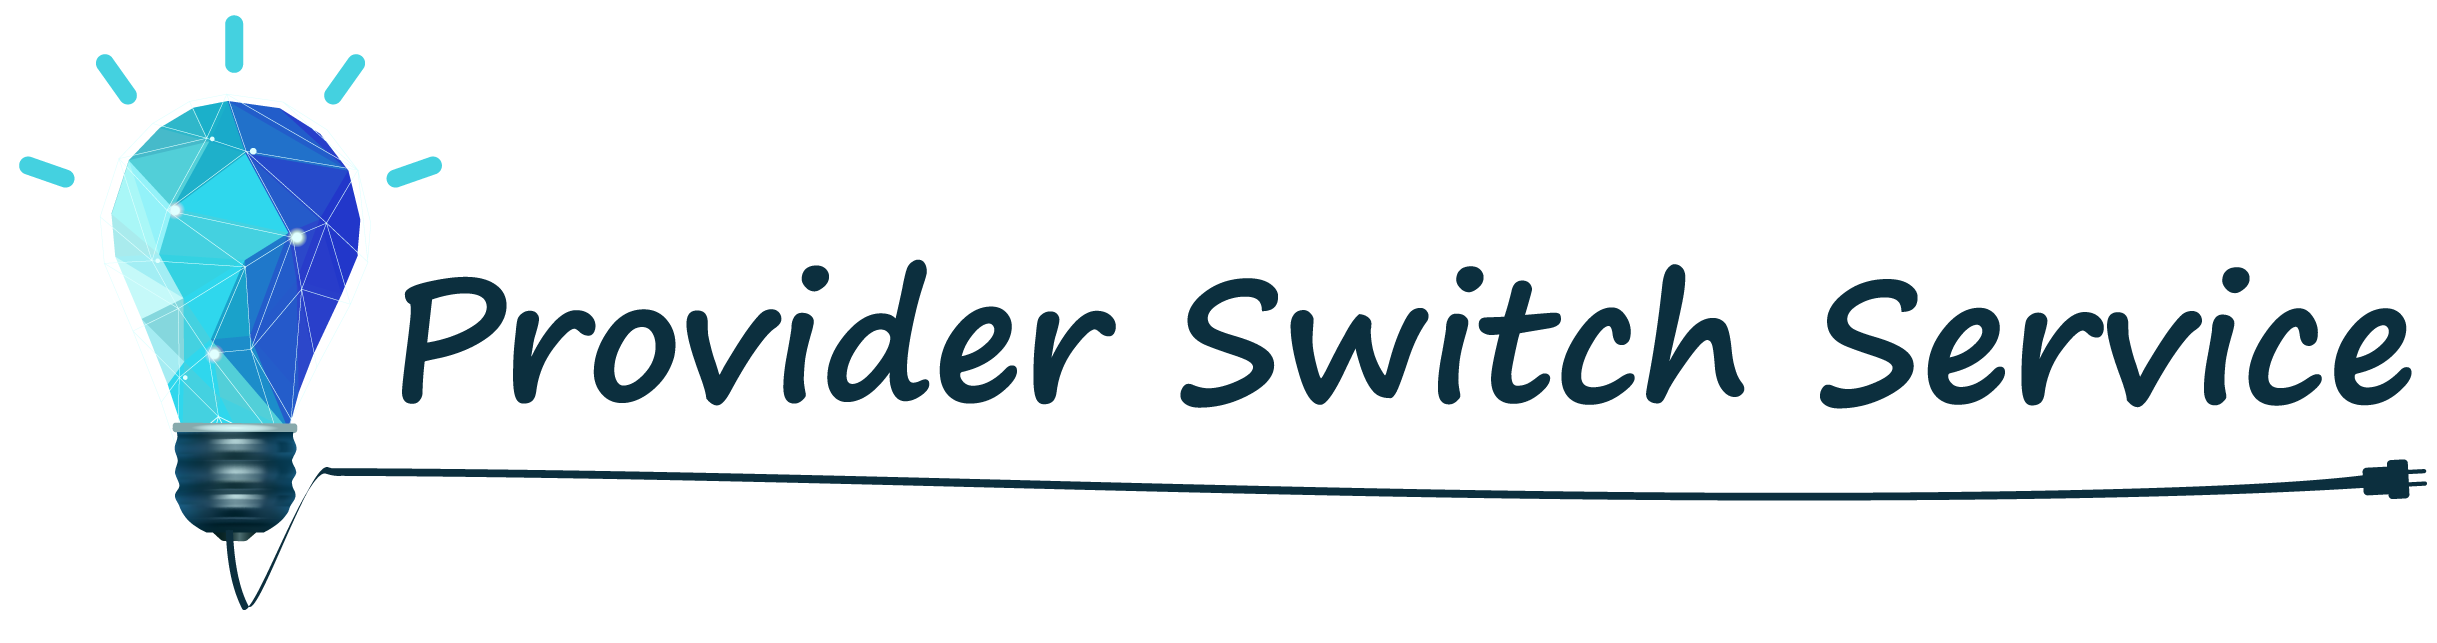 Provider Switch Service B.V.